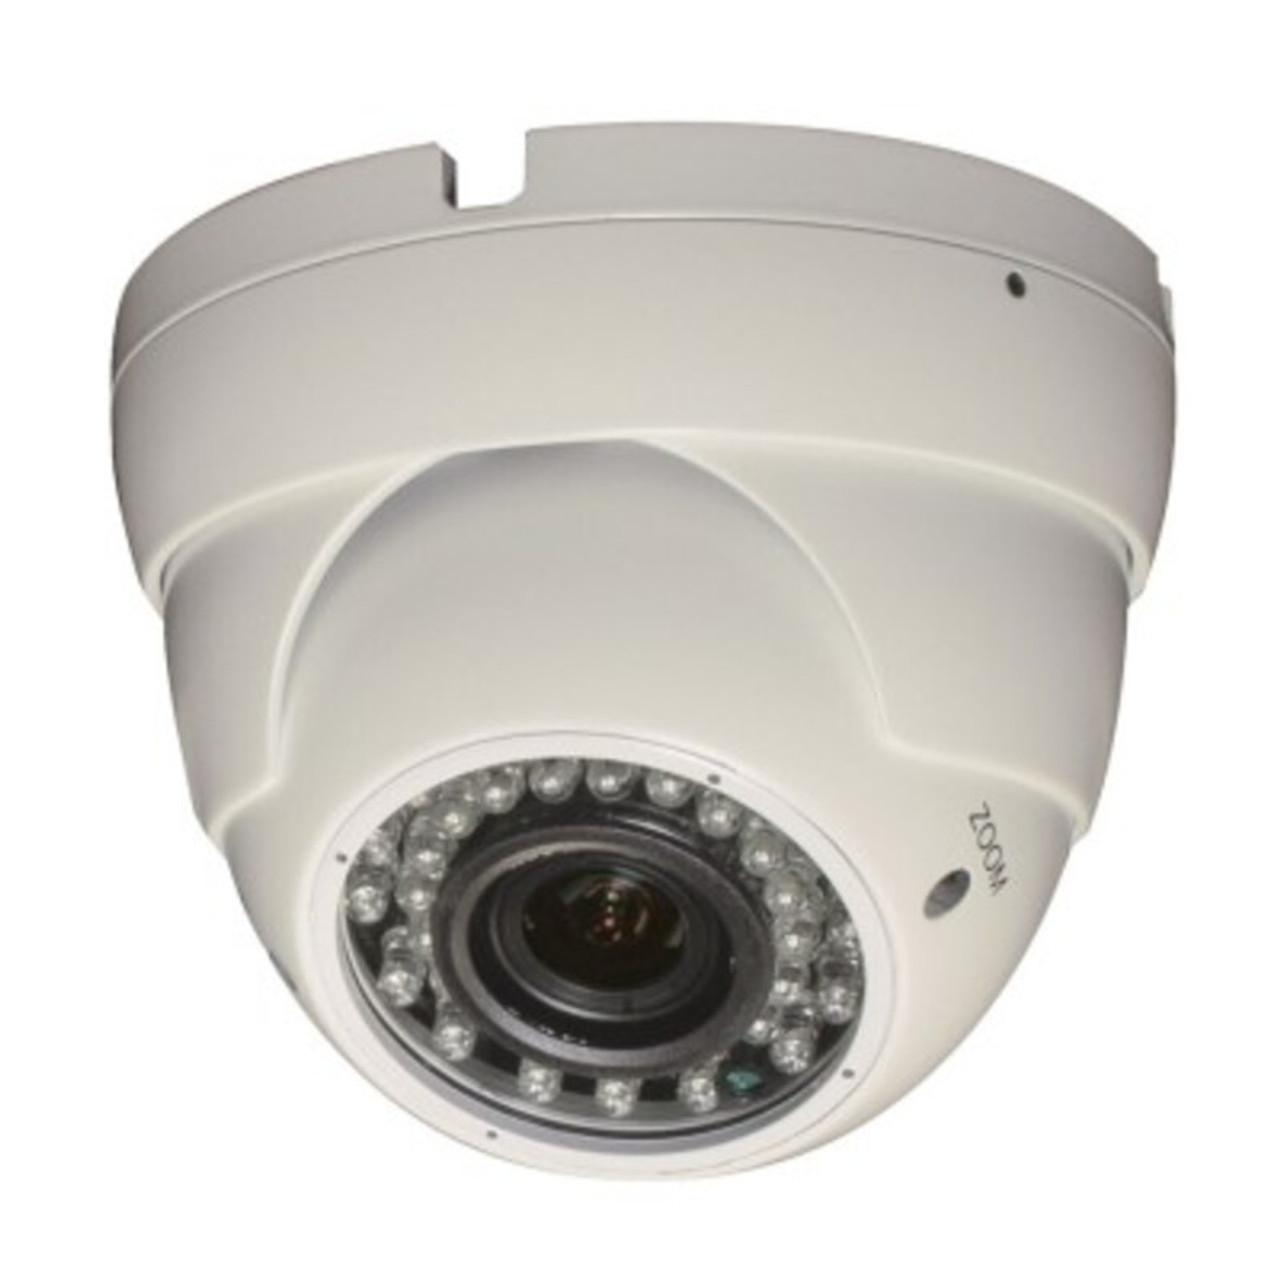 Lts Cmsd2023a 2mp Ir Turret Hd Cctv Security Camera